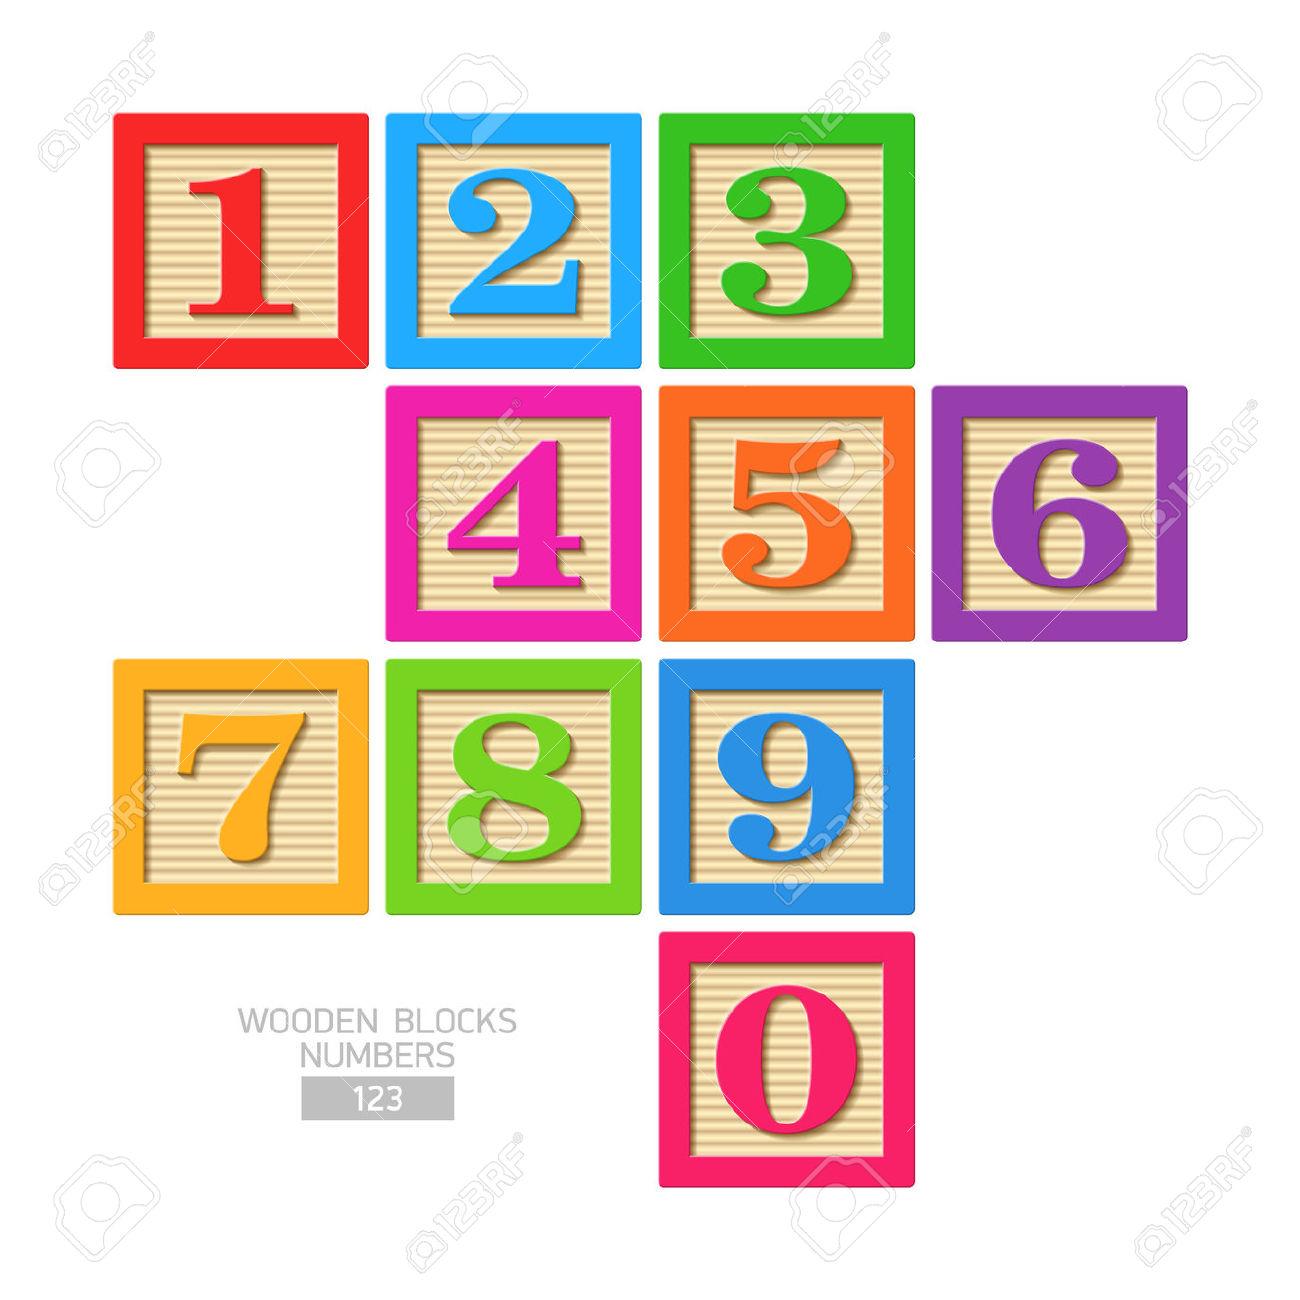 Block number clipart picture transparent download Block number clipart - ClipartFest picture transparent download